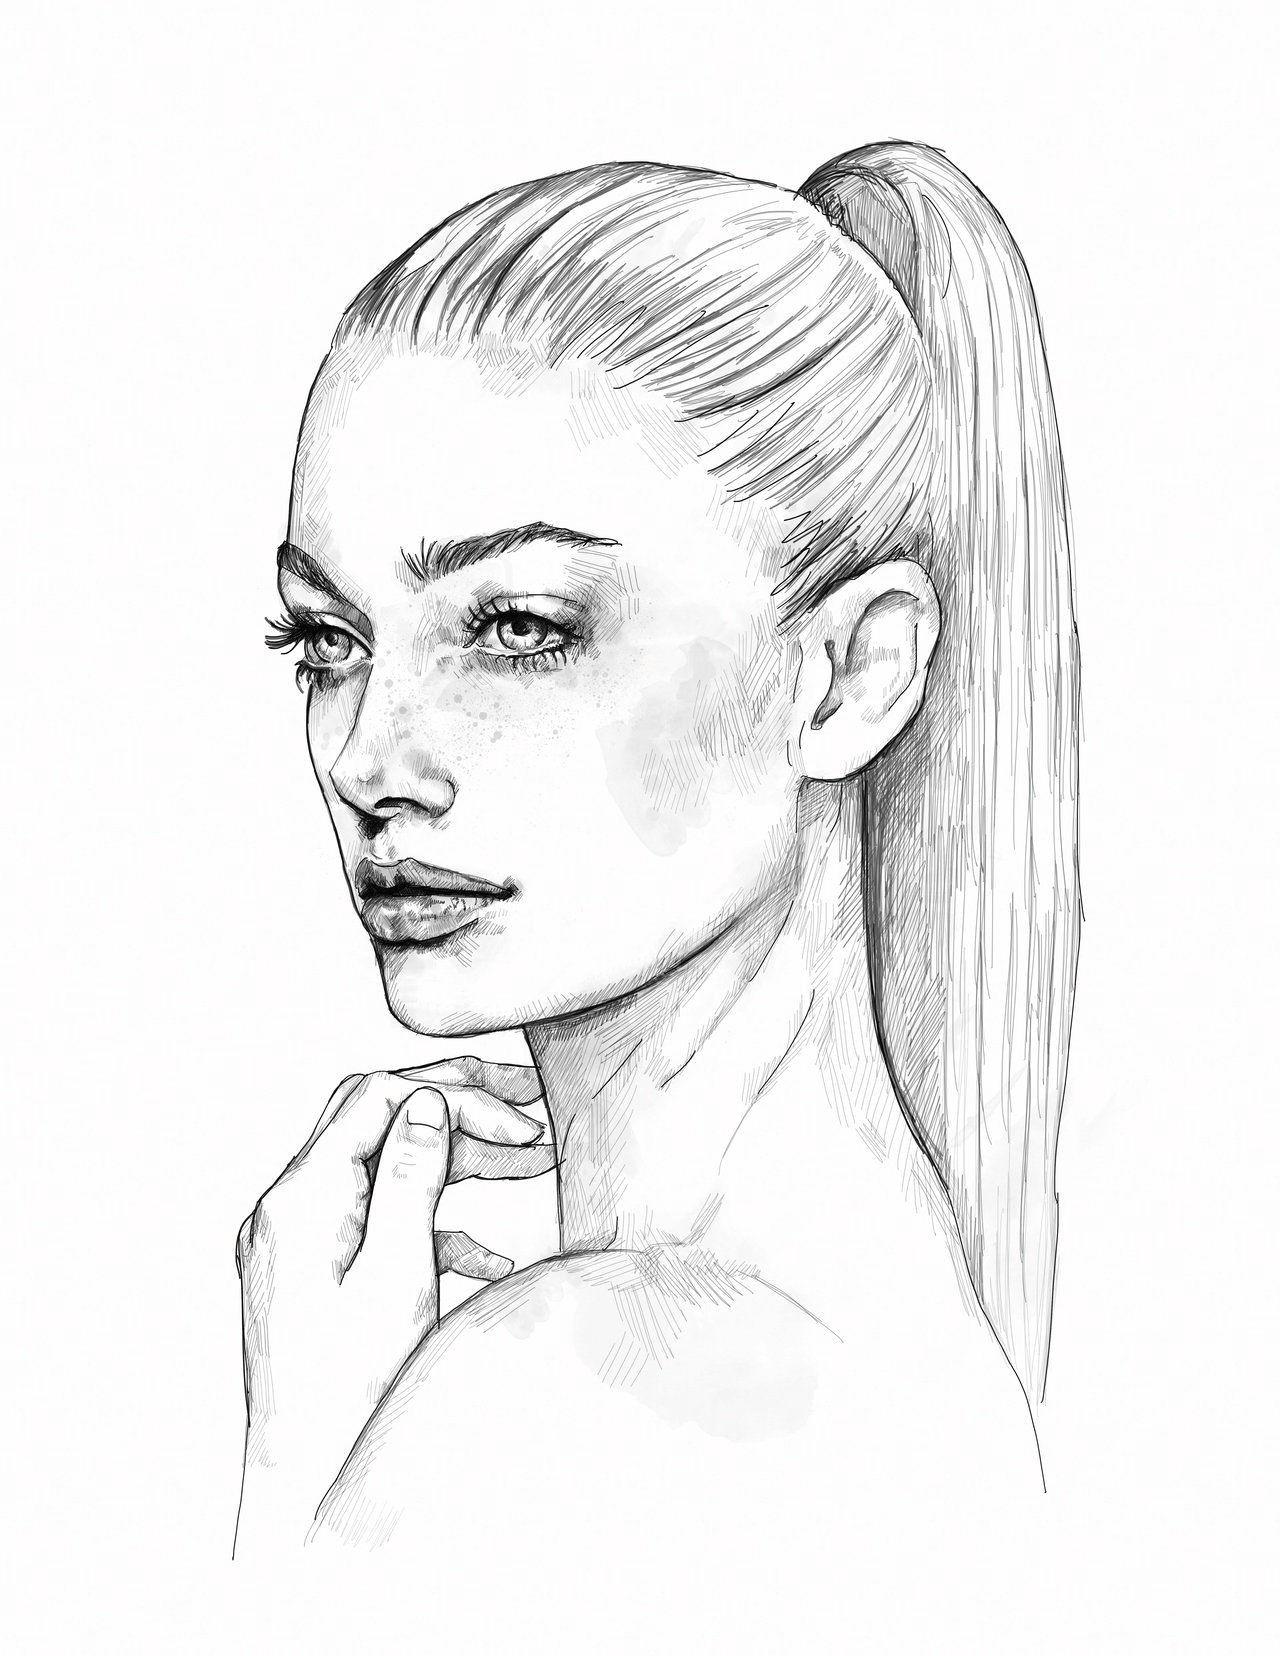 easy pencil drawings of faces a a aa arte de katie jagielnicka art portraiture of easy